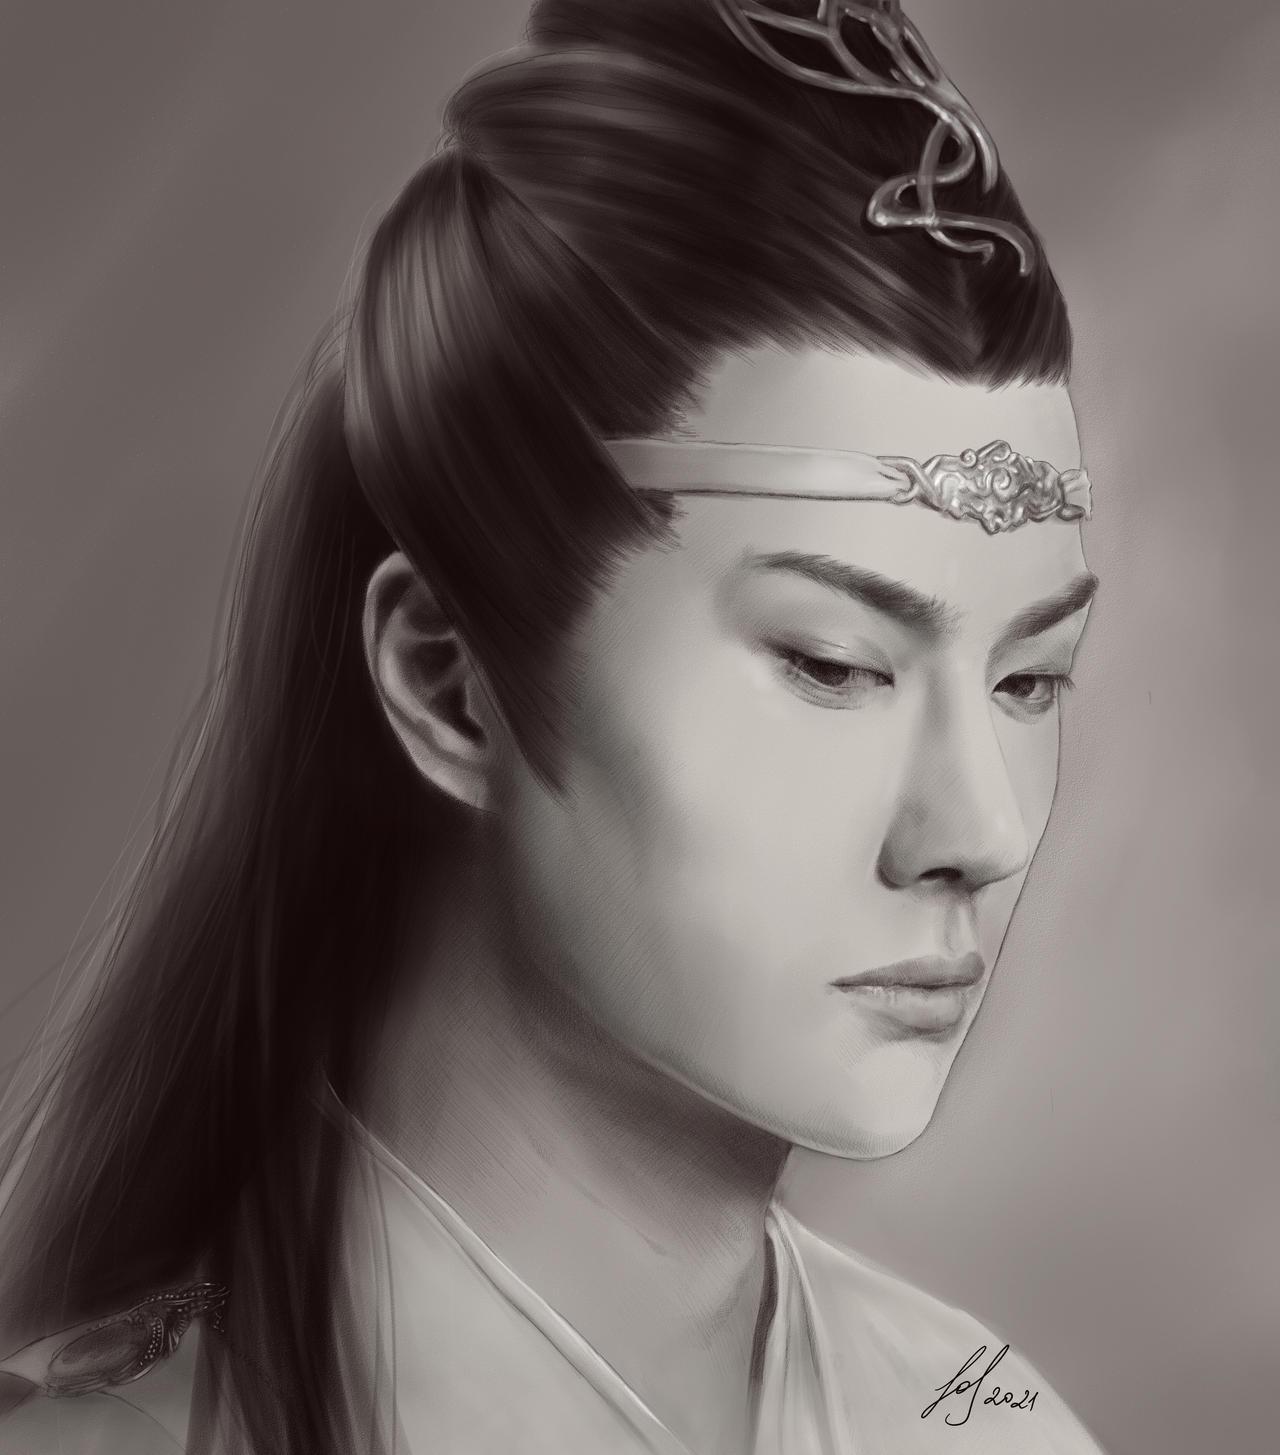 Lan Wangji